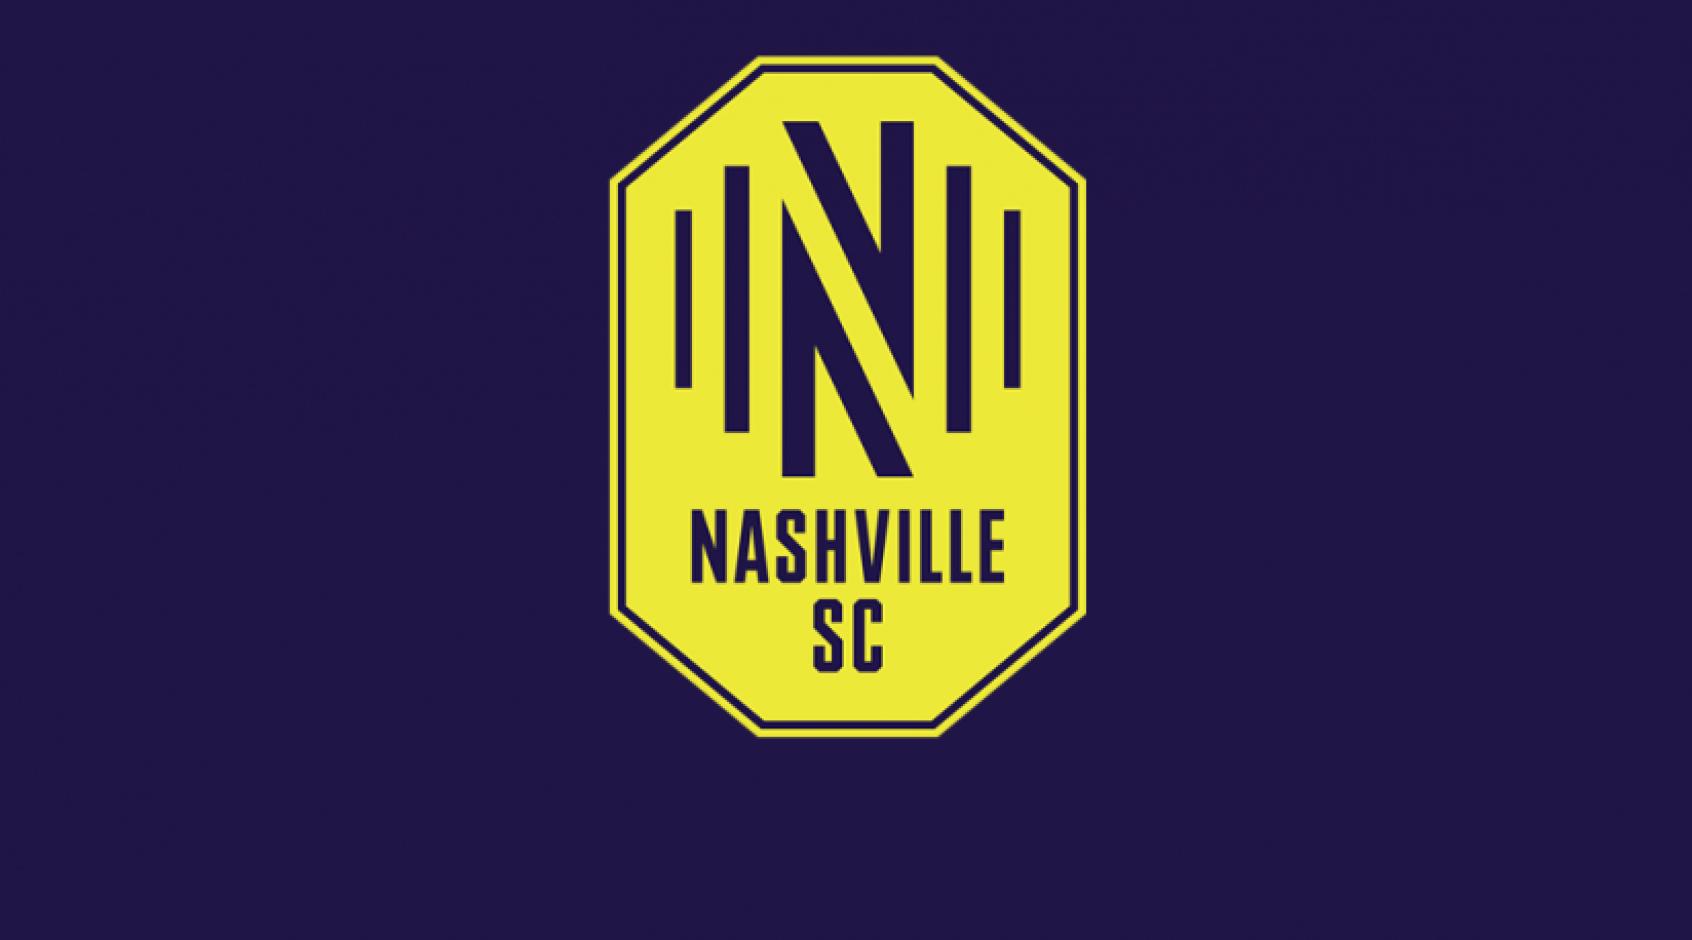 """Нэшвилл"" отказался от участия в турнире MLS is Back из-за коронавируса в команде"